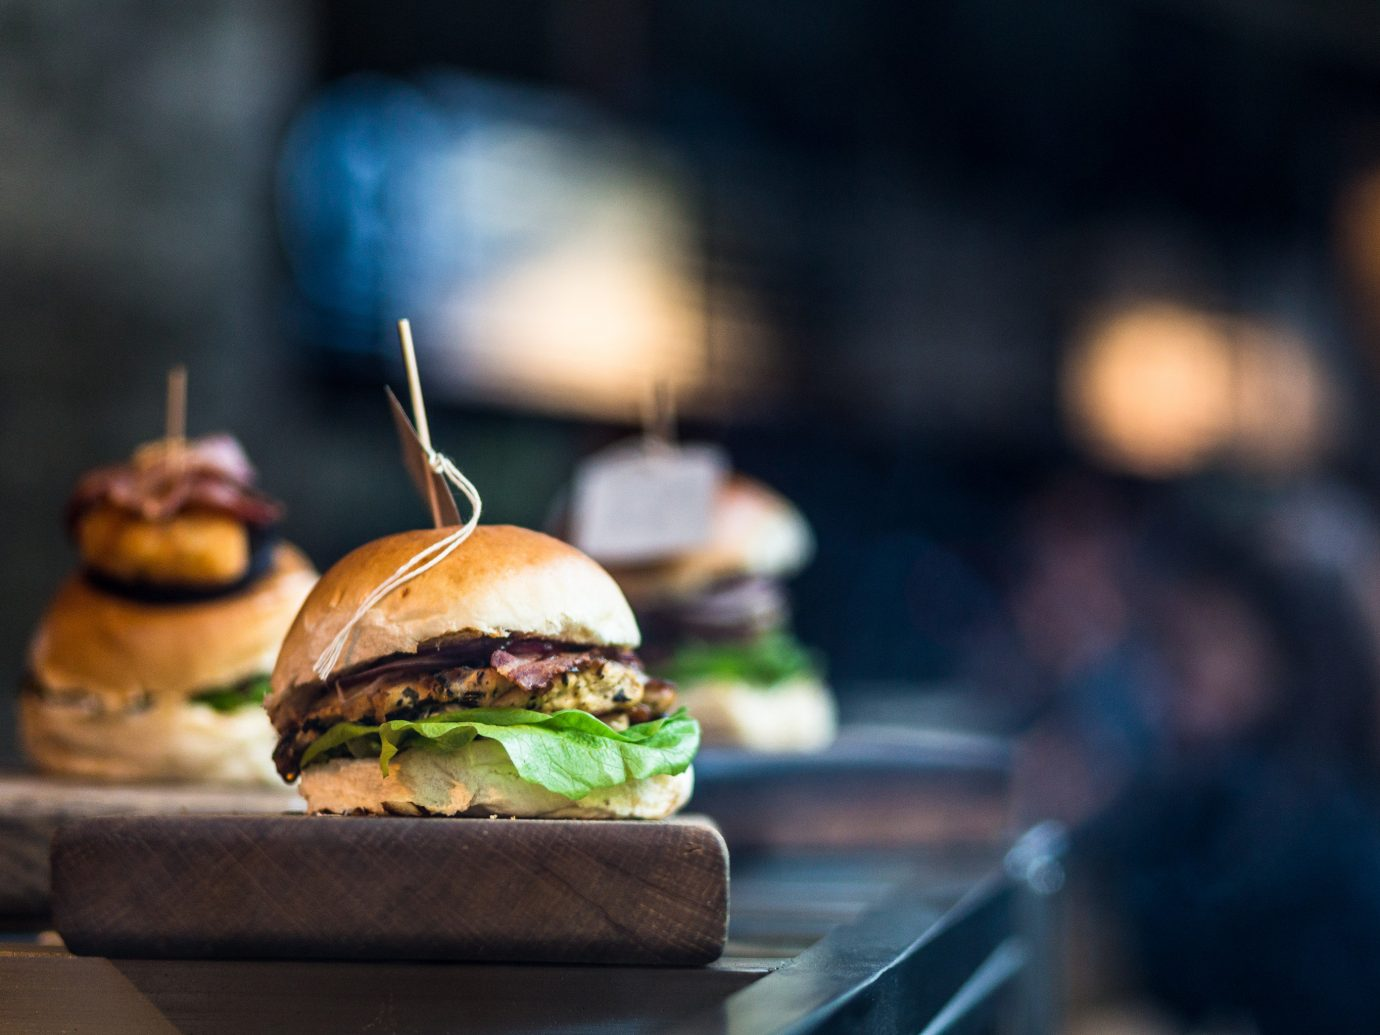 Food + Drink indoor food meal sandwich restaurant dish snack food sense cuisine